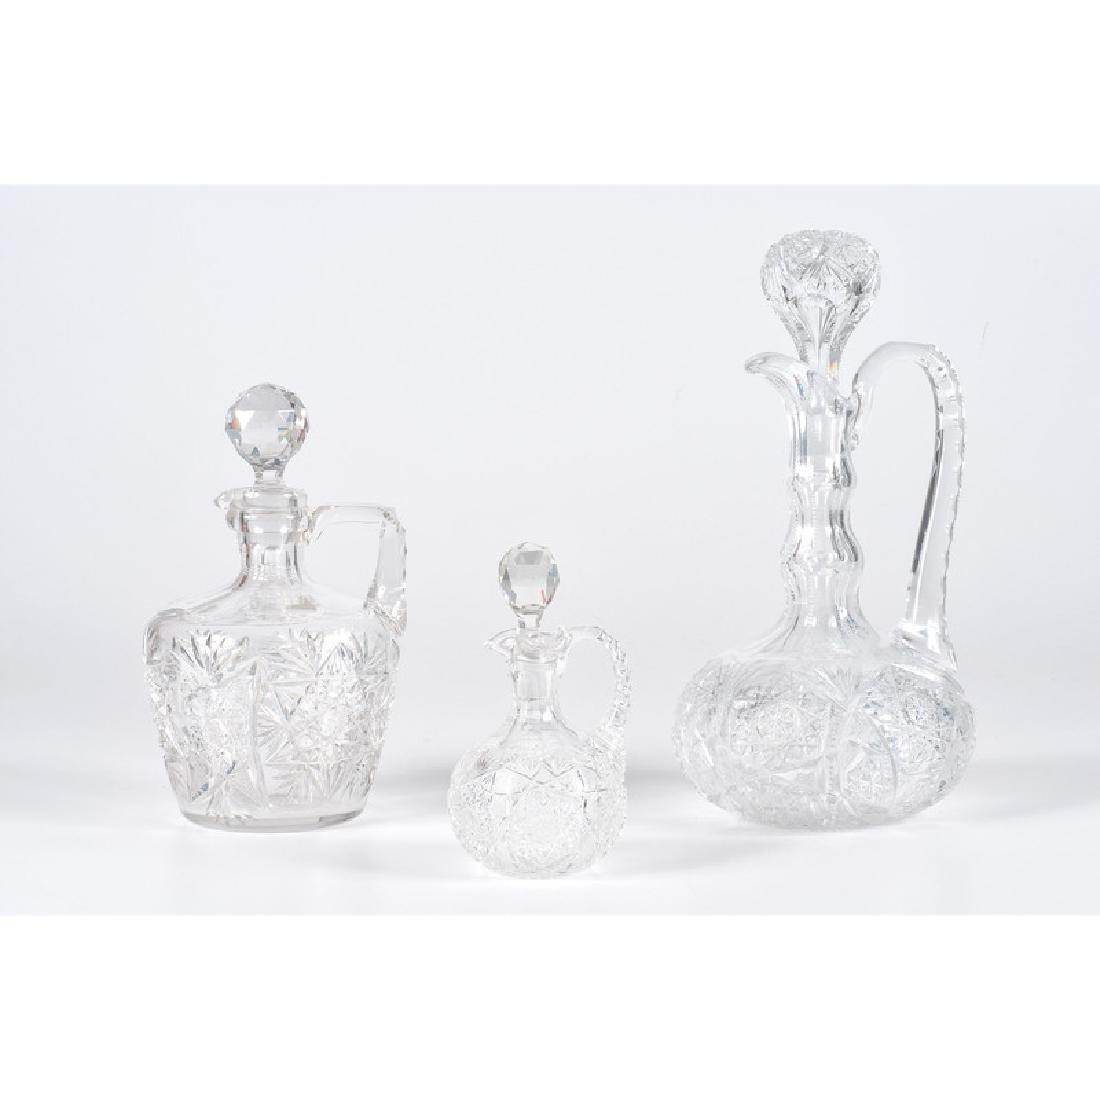 Cut Glass Carafes